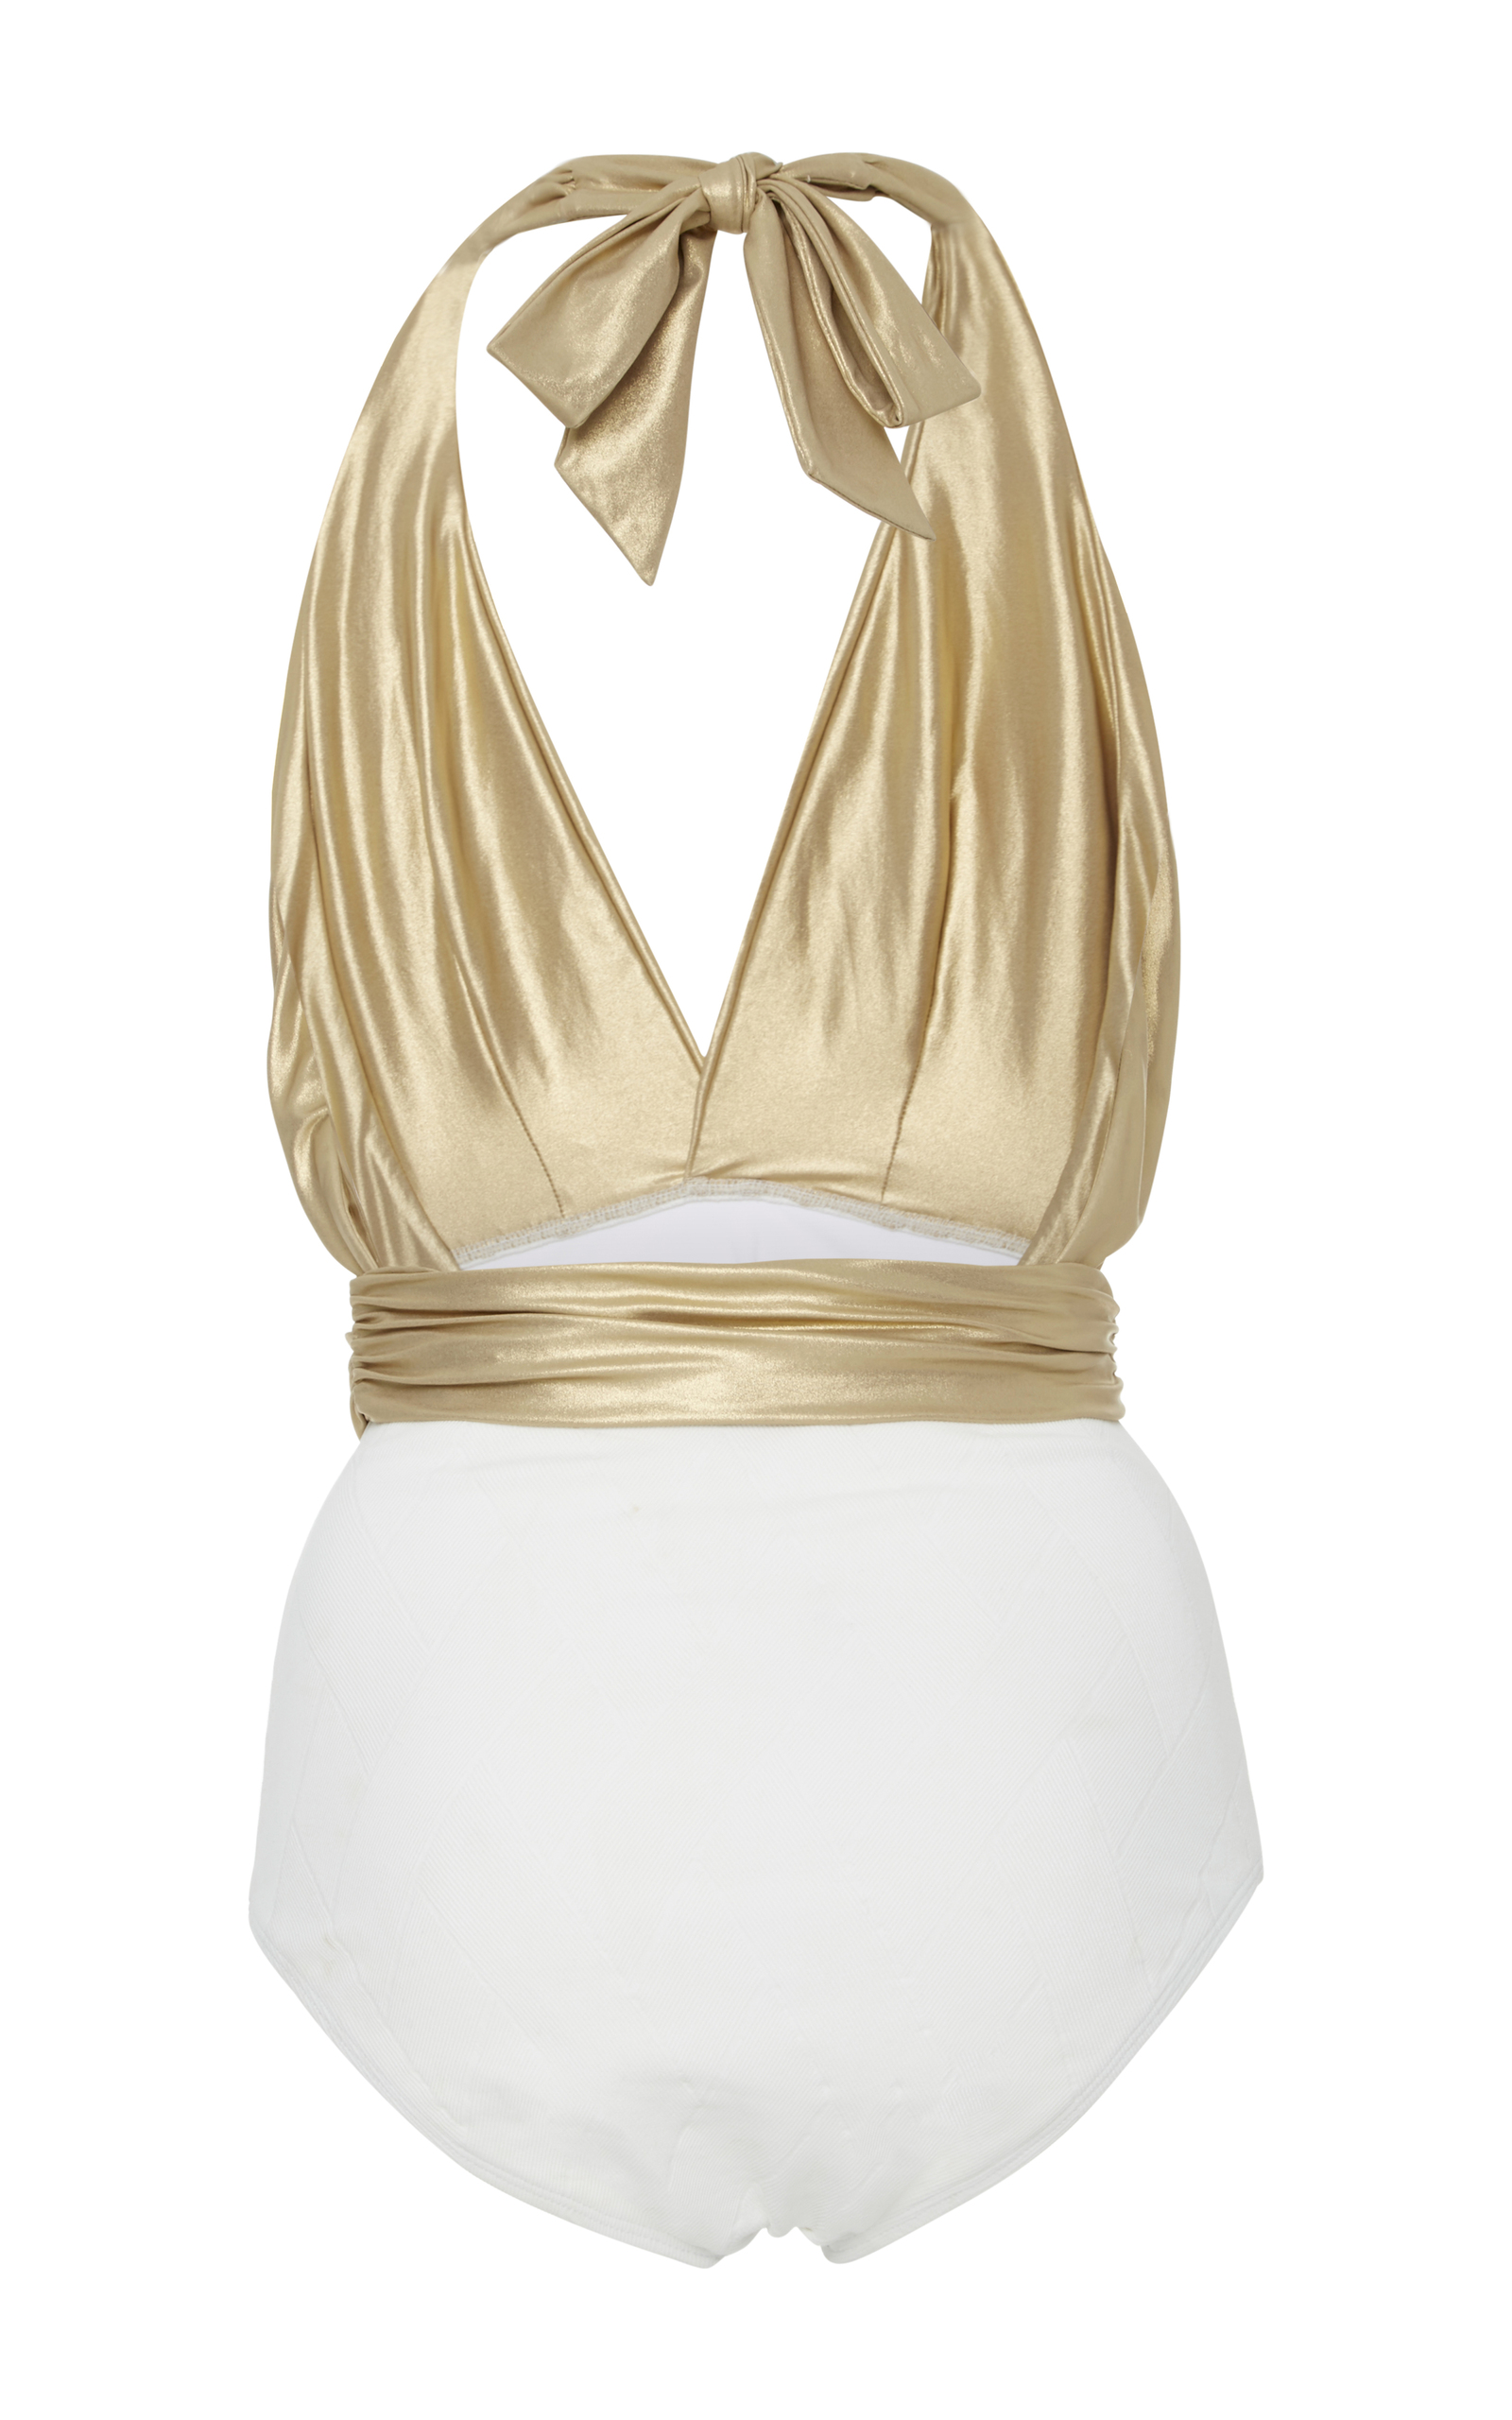 Jerry Metallic Halterneck Swimsuit By Flagpole X Oscar